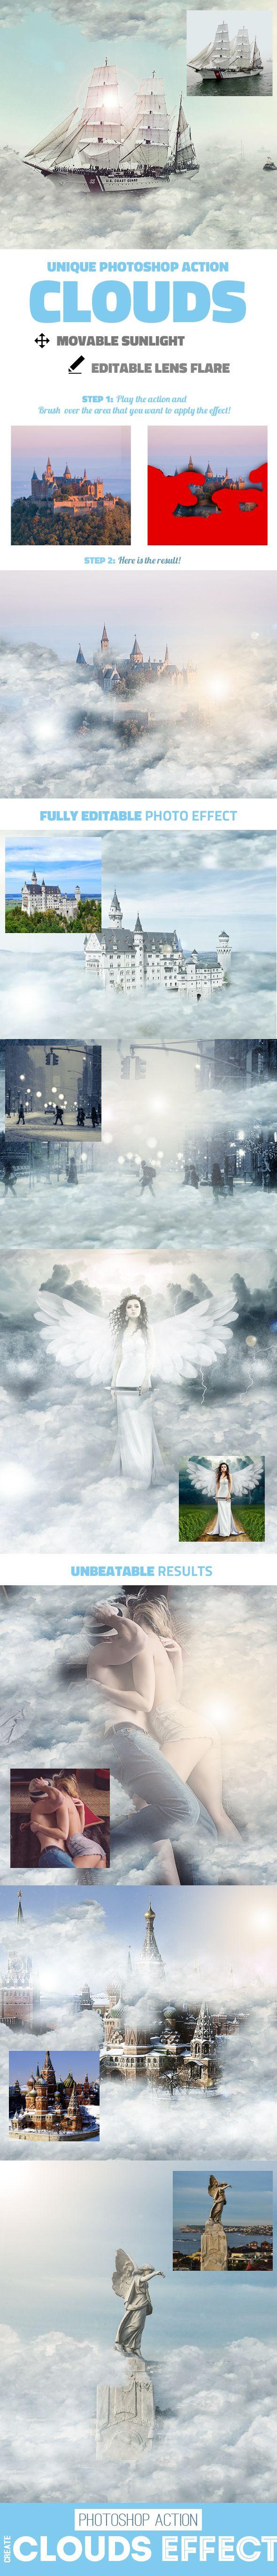 Clouds Photoshop Action #photoeffect Download: http://graphicriver.net/item/clouds-photoshop-action/14468638?ref=ksioks